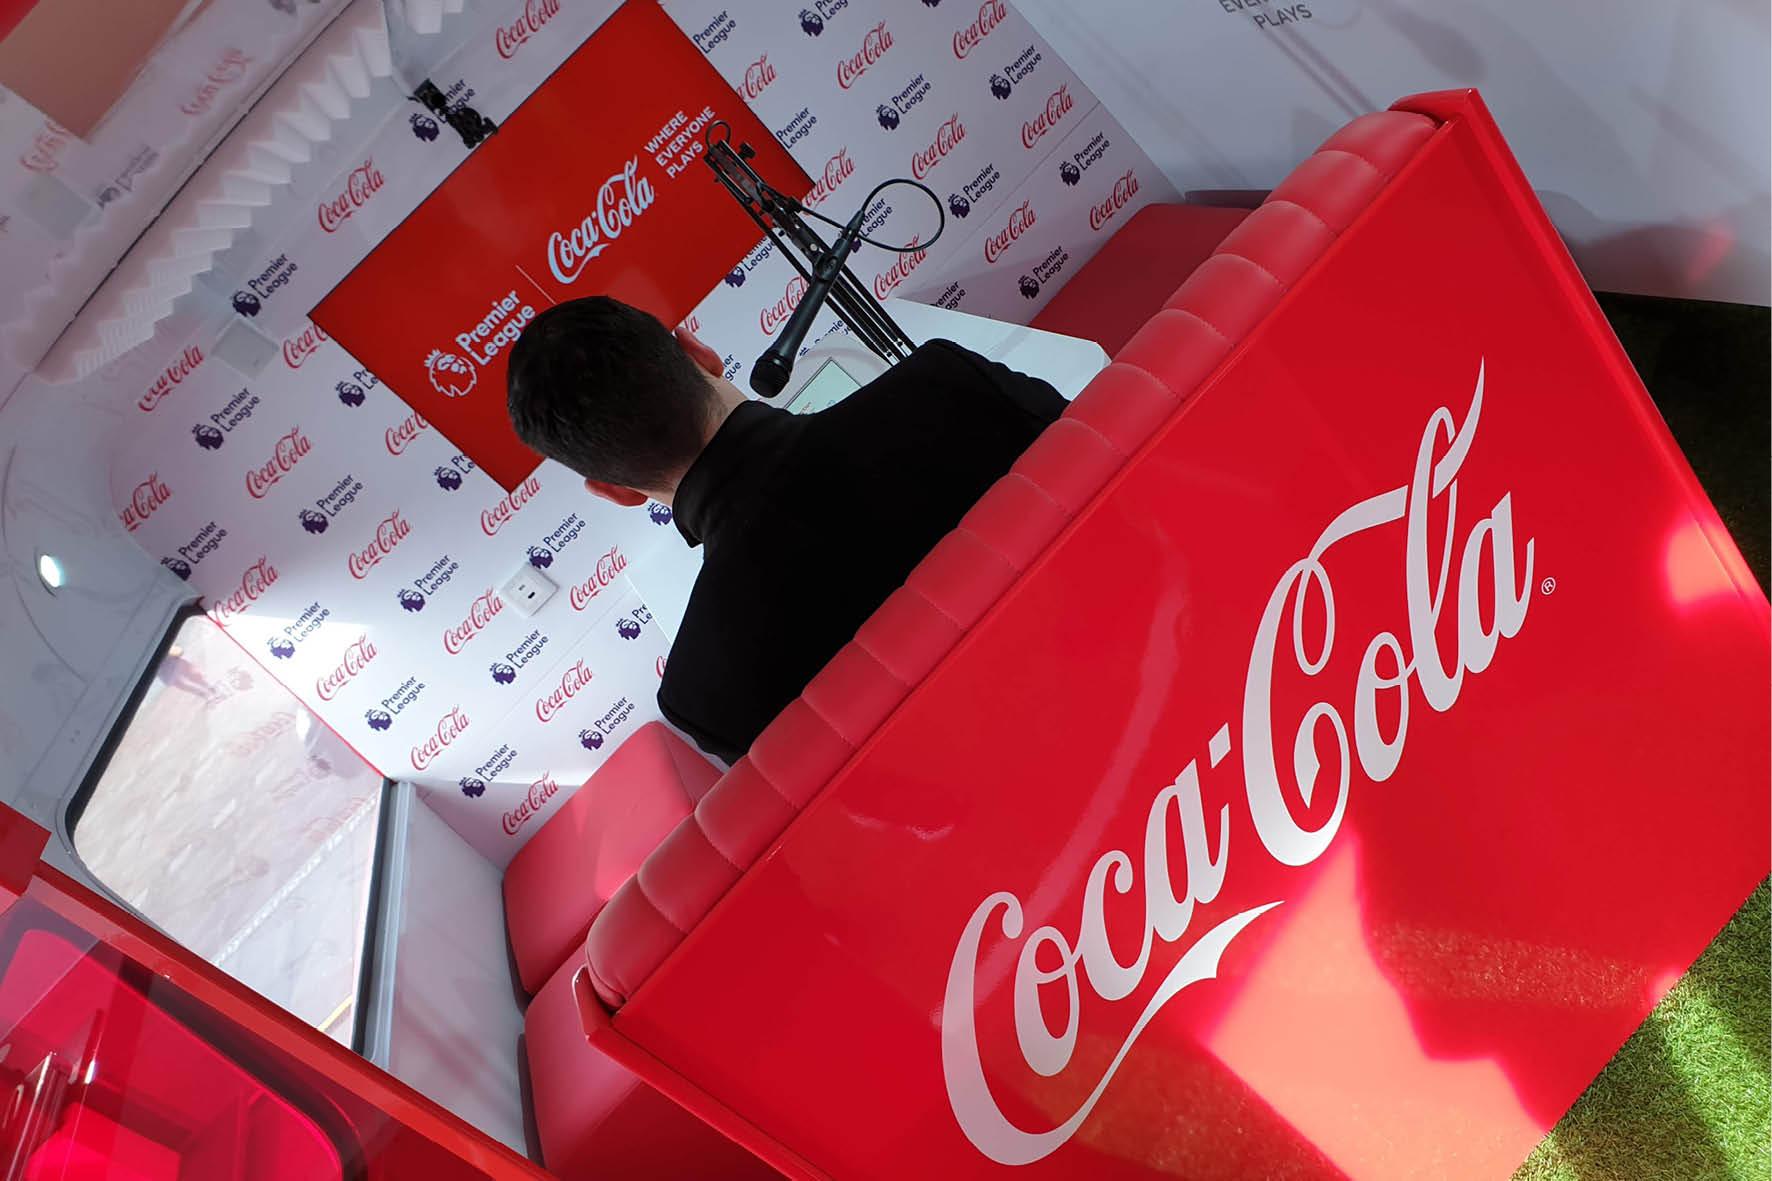 bus_business_2019_coca_cola_4.jpg